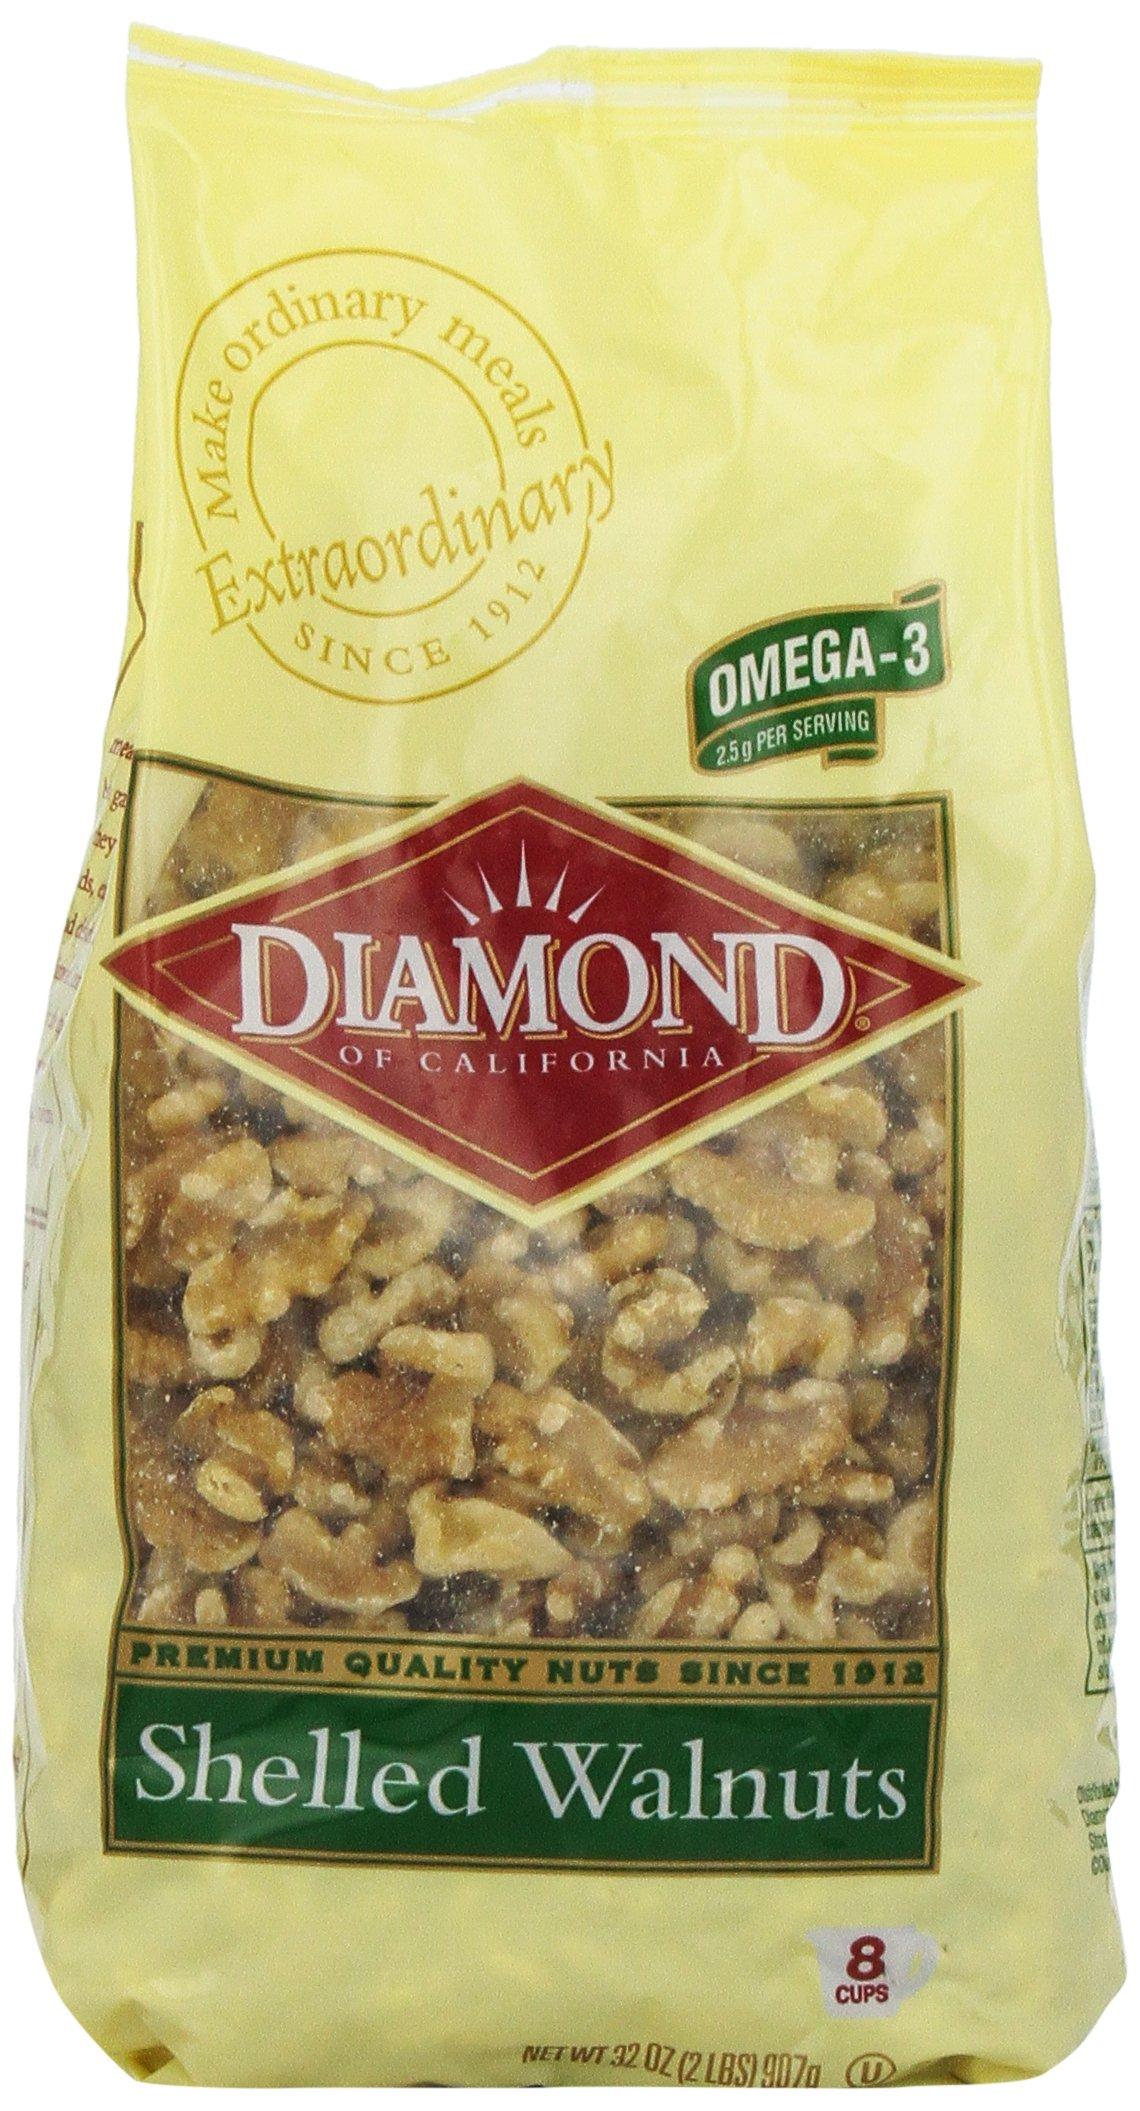 Diamond of California Shelled Walnuts, 32 Ounce